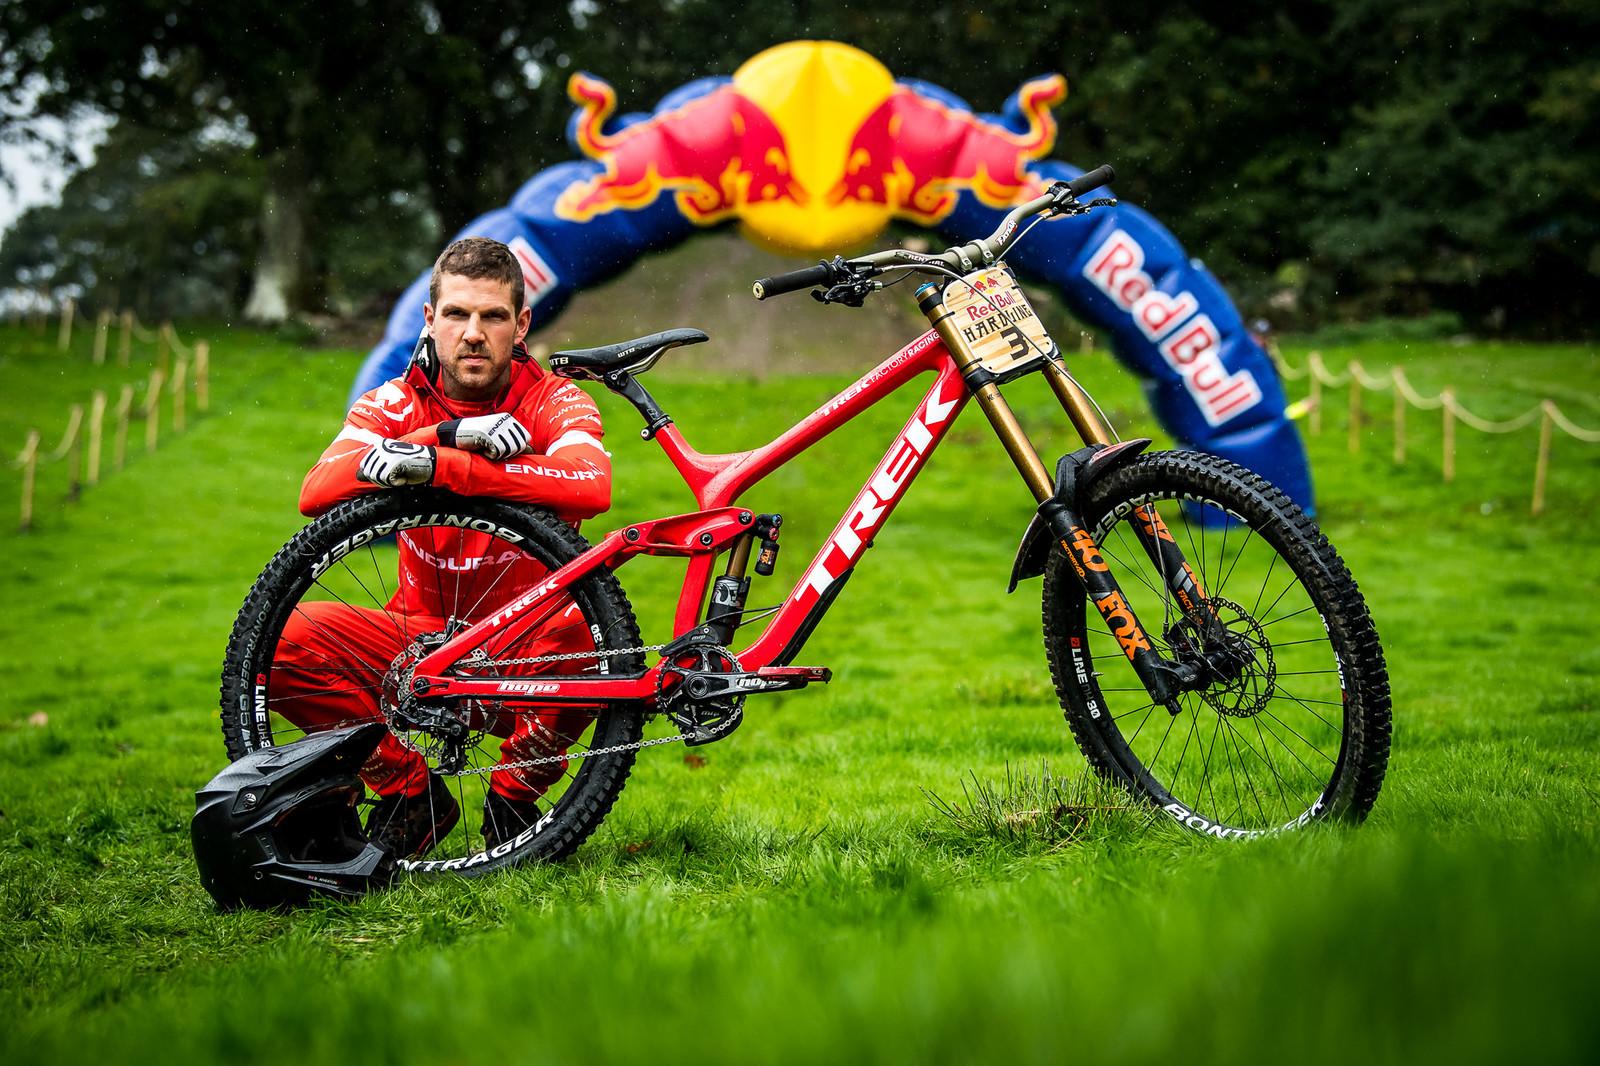 Dan Atherton and His Trek Session - Red Bull Hardline 2018 Riders and Bikes - Mountain Biking Pictures - Vital MTB